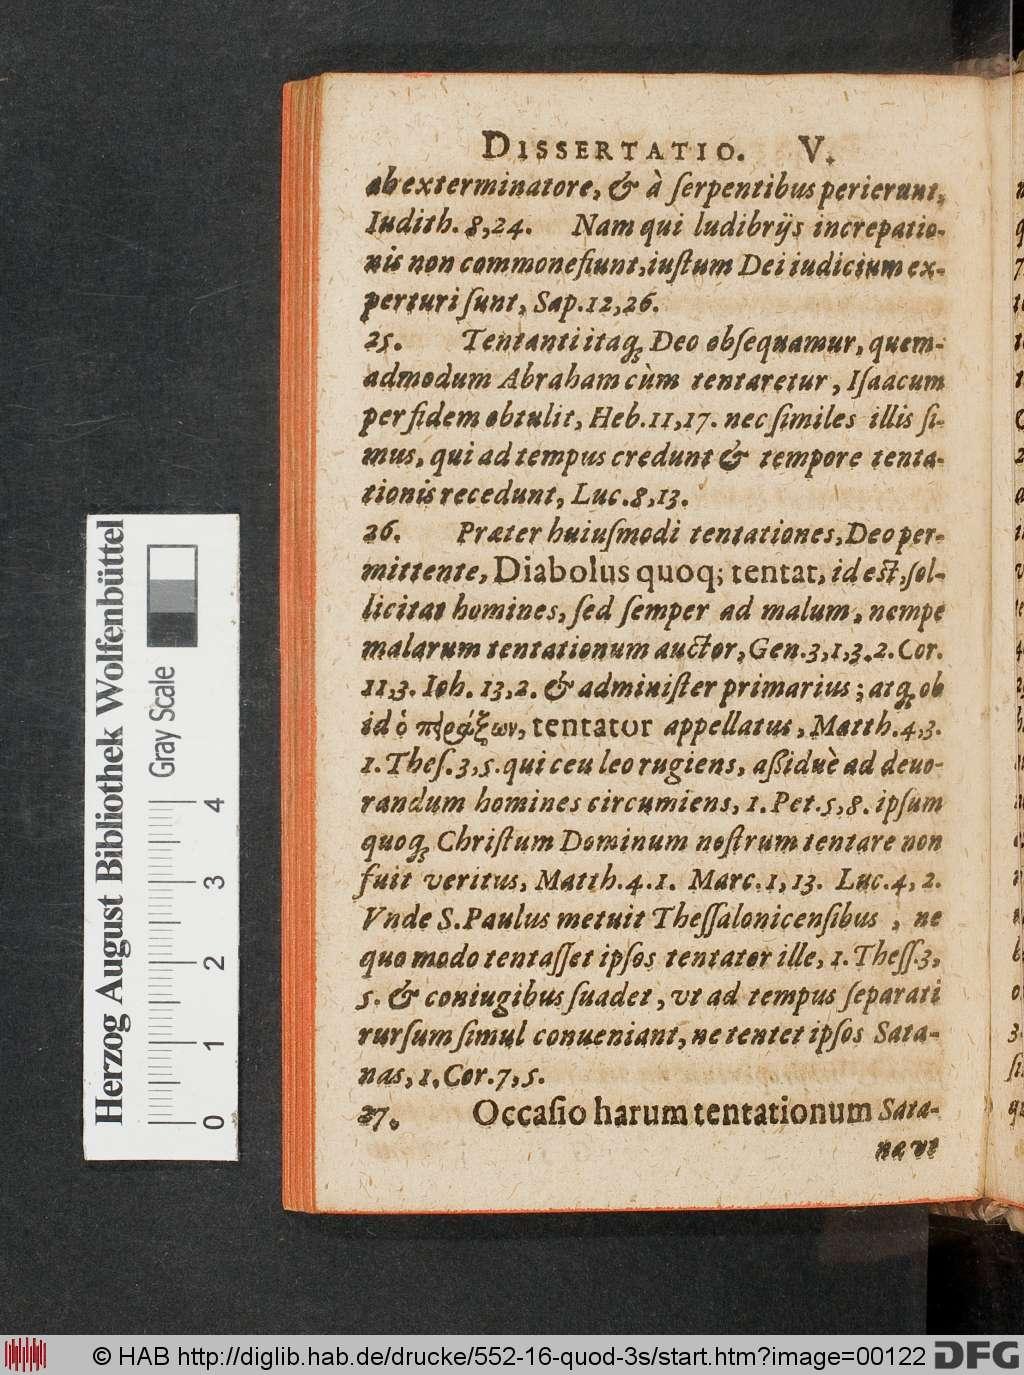 http://diglib.hab.de/drucke/552-16-quod-3s/00122.jpg